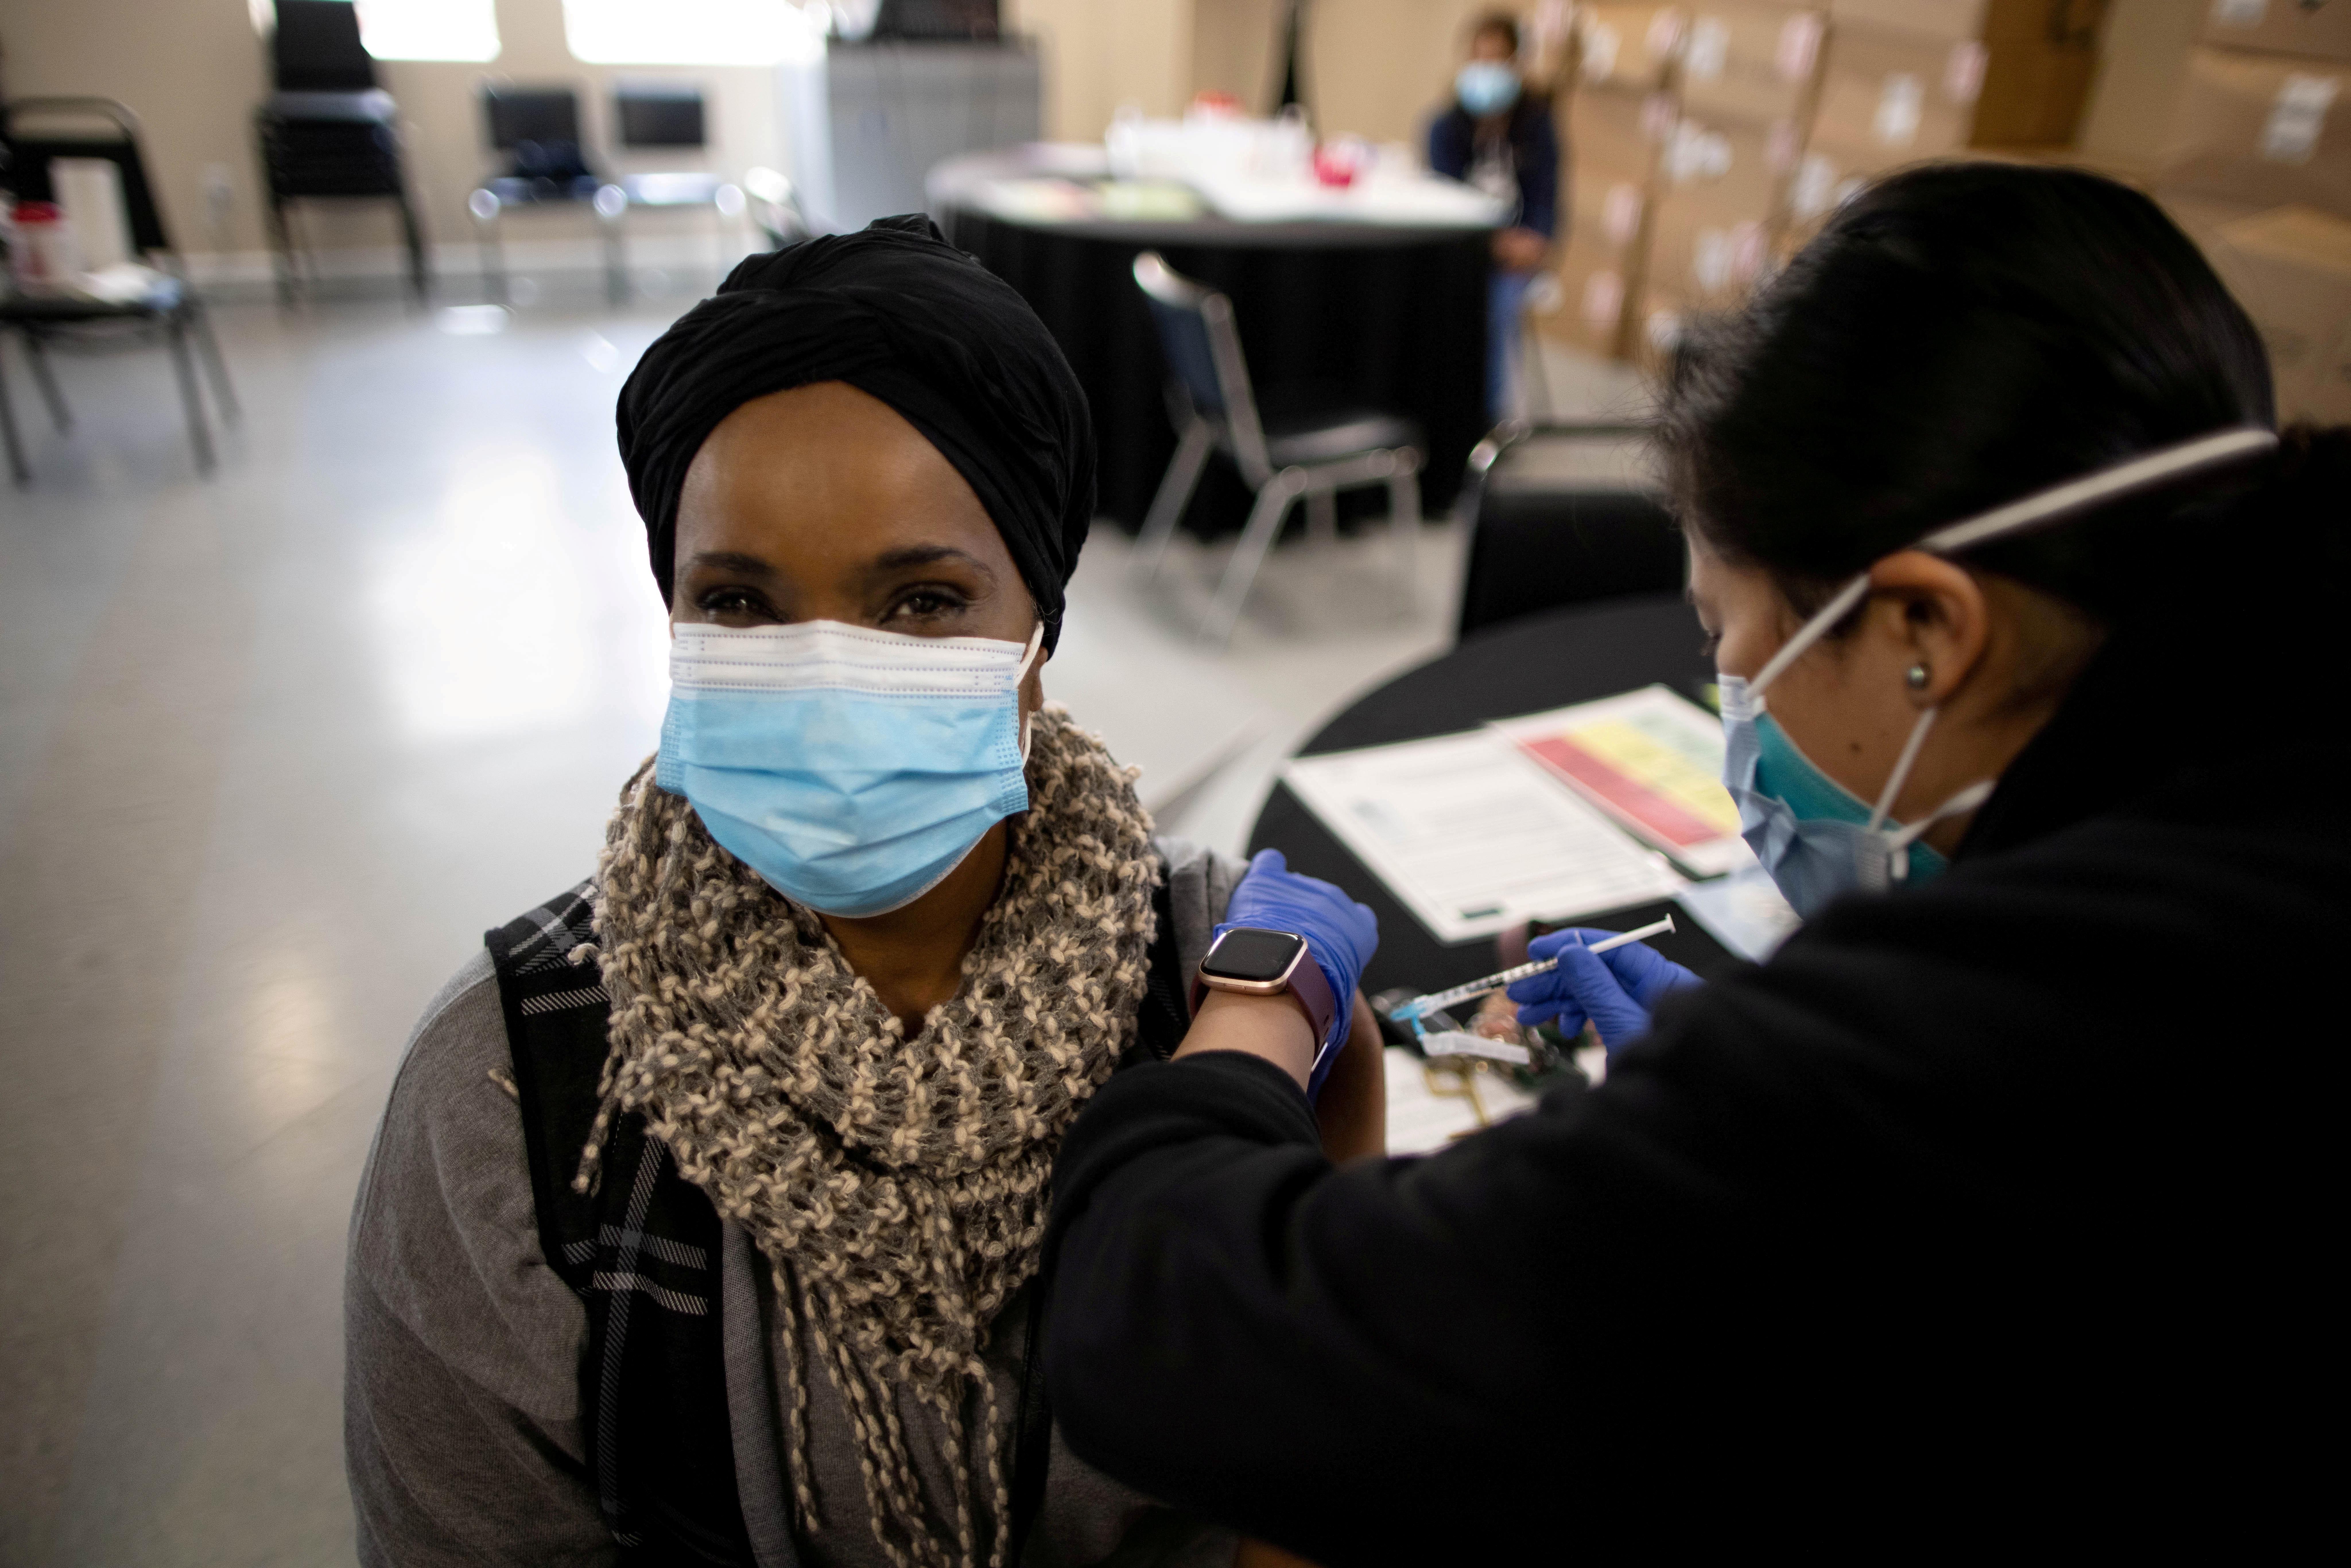 Marla Brandon-Stewart receives a second coronavirus disease (COVID-19) vaccination, in Los Angeles, California, U.S., March 12, 2021. REUTERS/Lucy Nicholson/File Photo